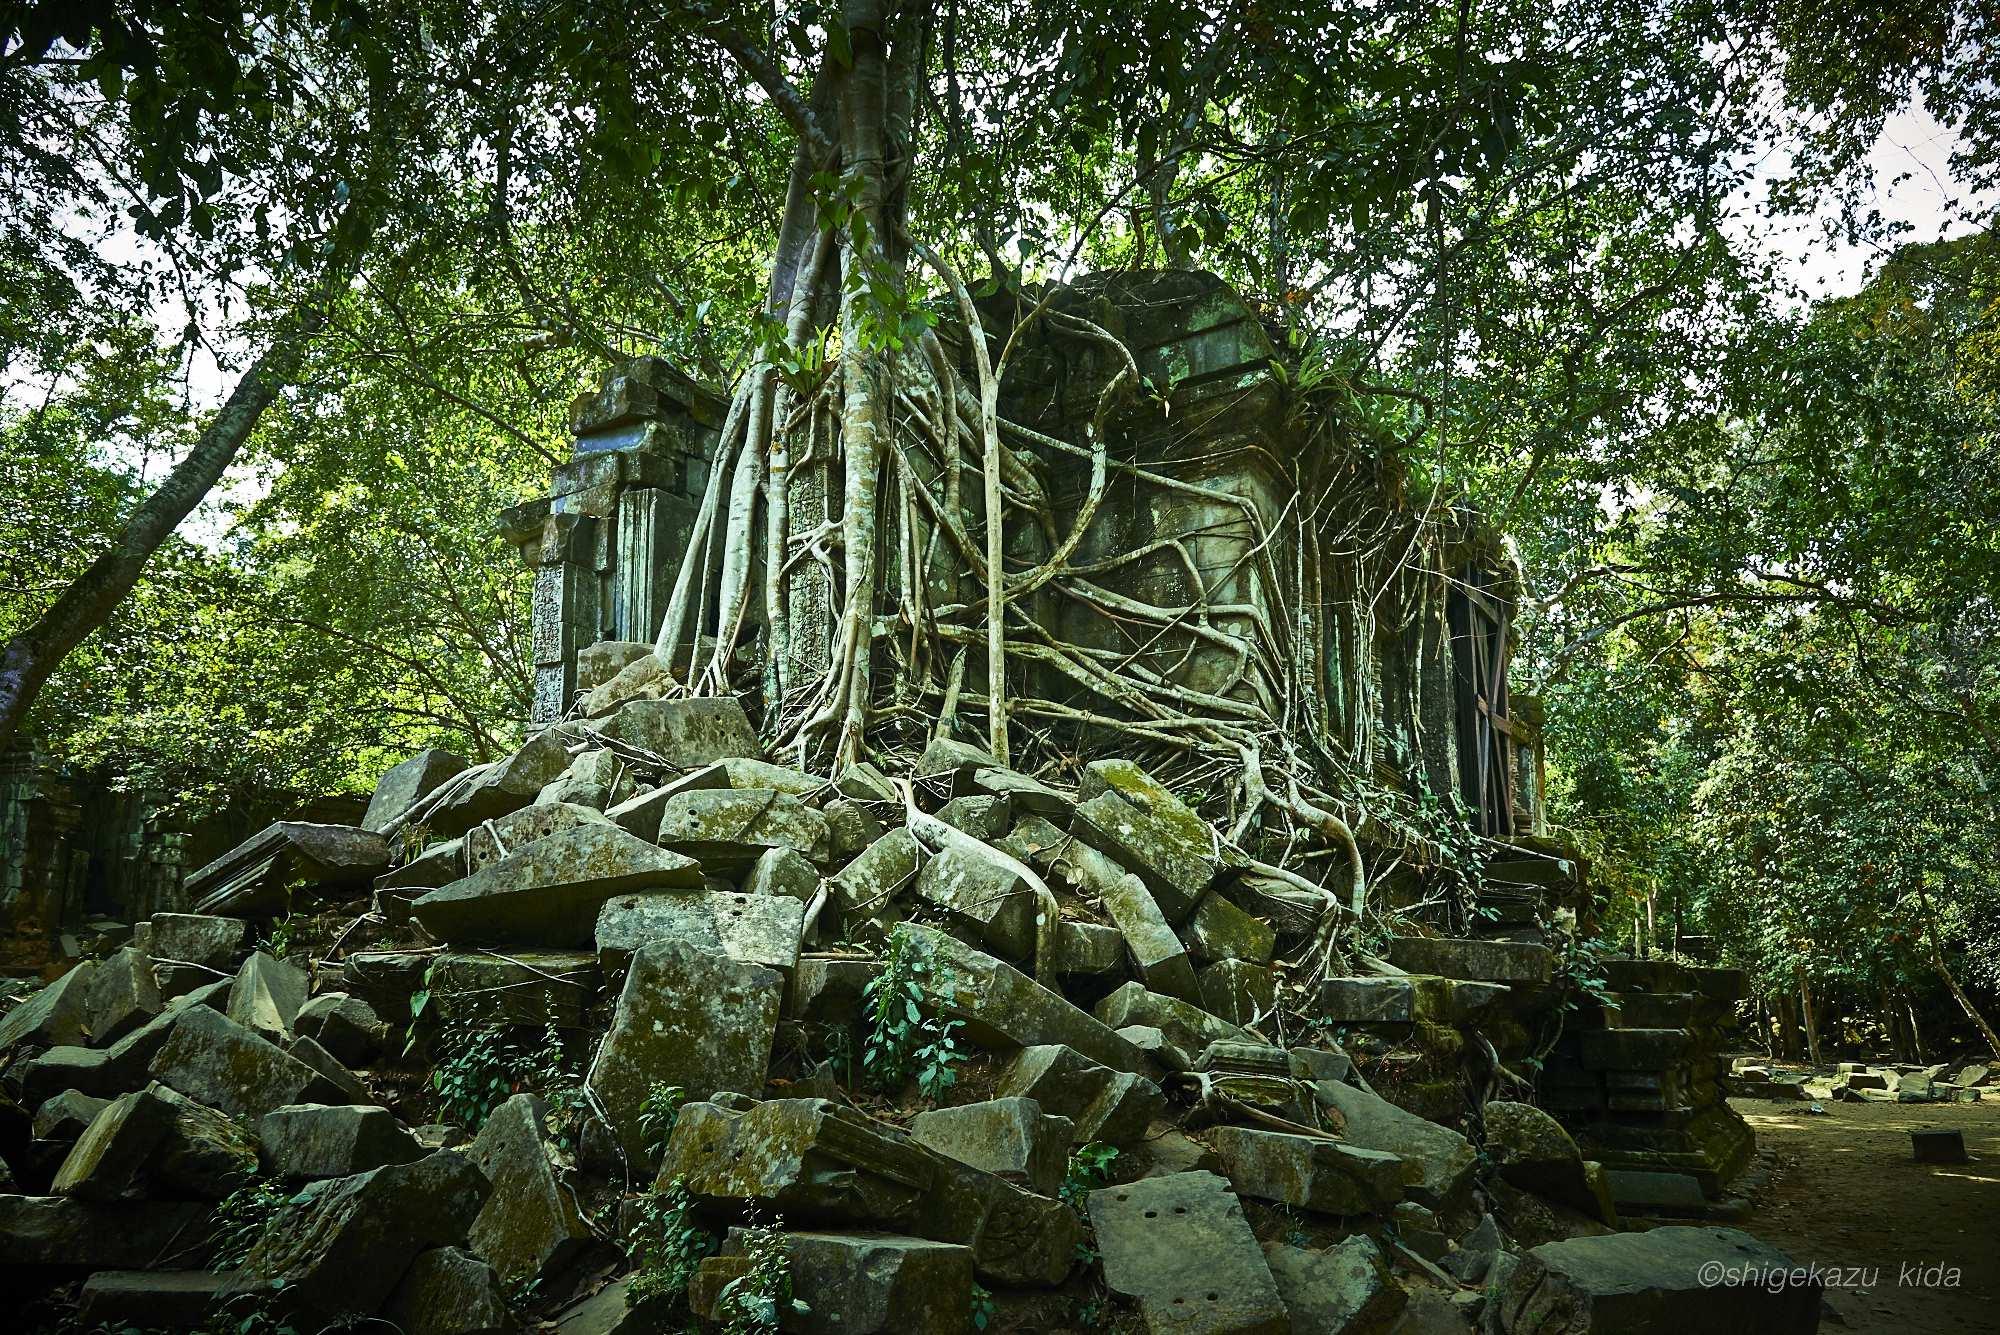 Angkor(アンコール)遺跡群にあるBengMealea(ベン・メリア)の木に侵食された経蔵